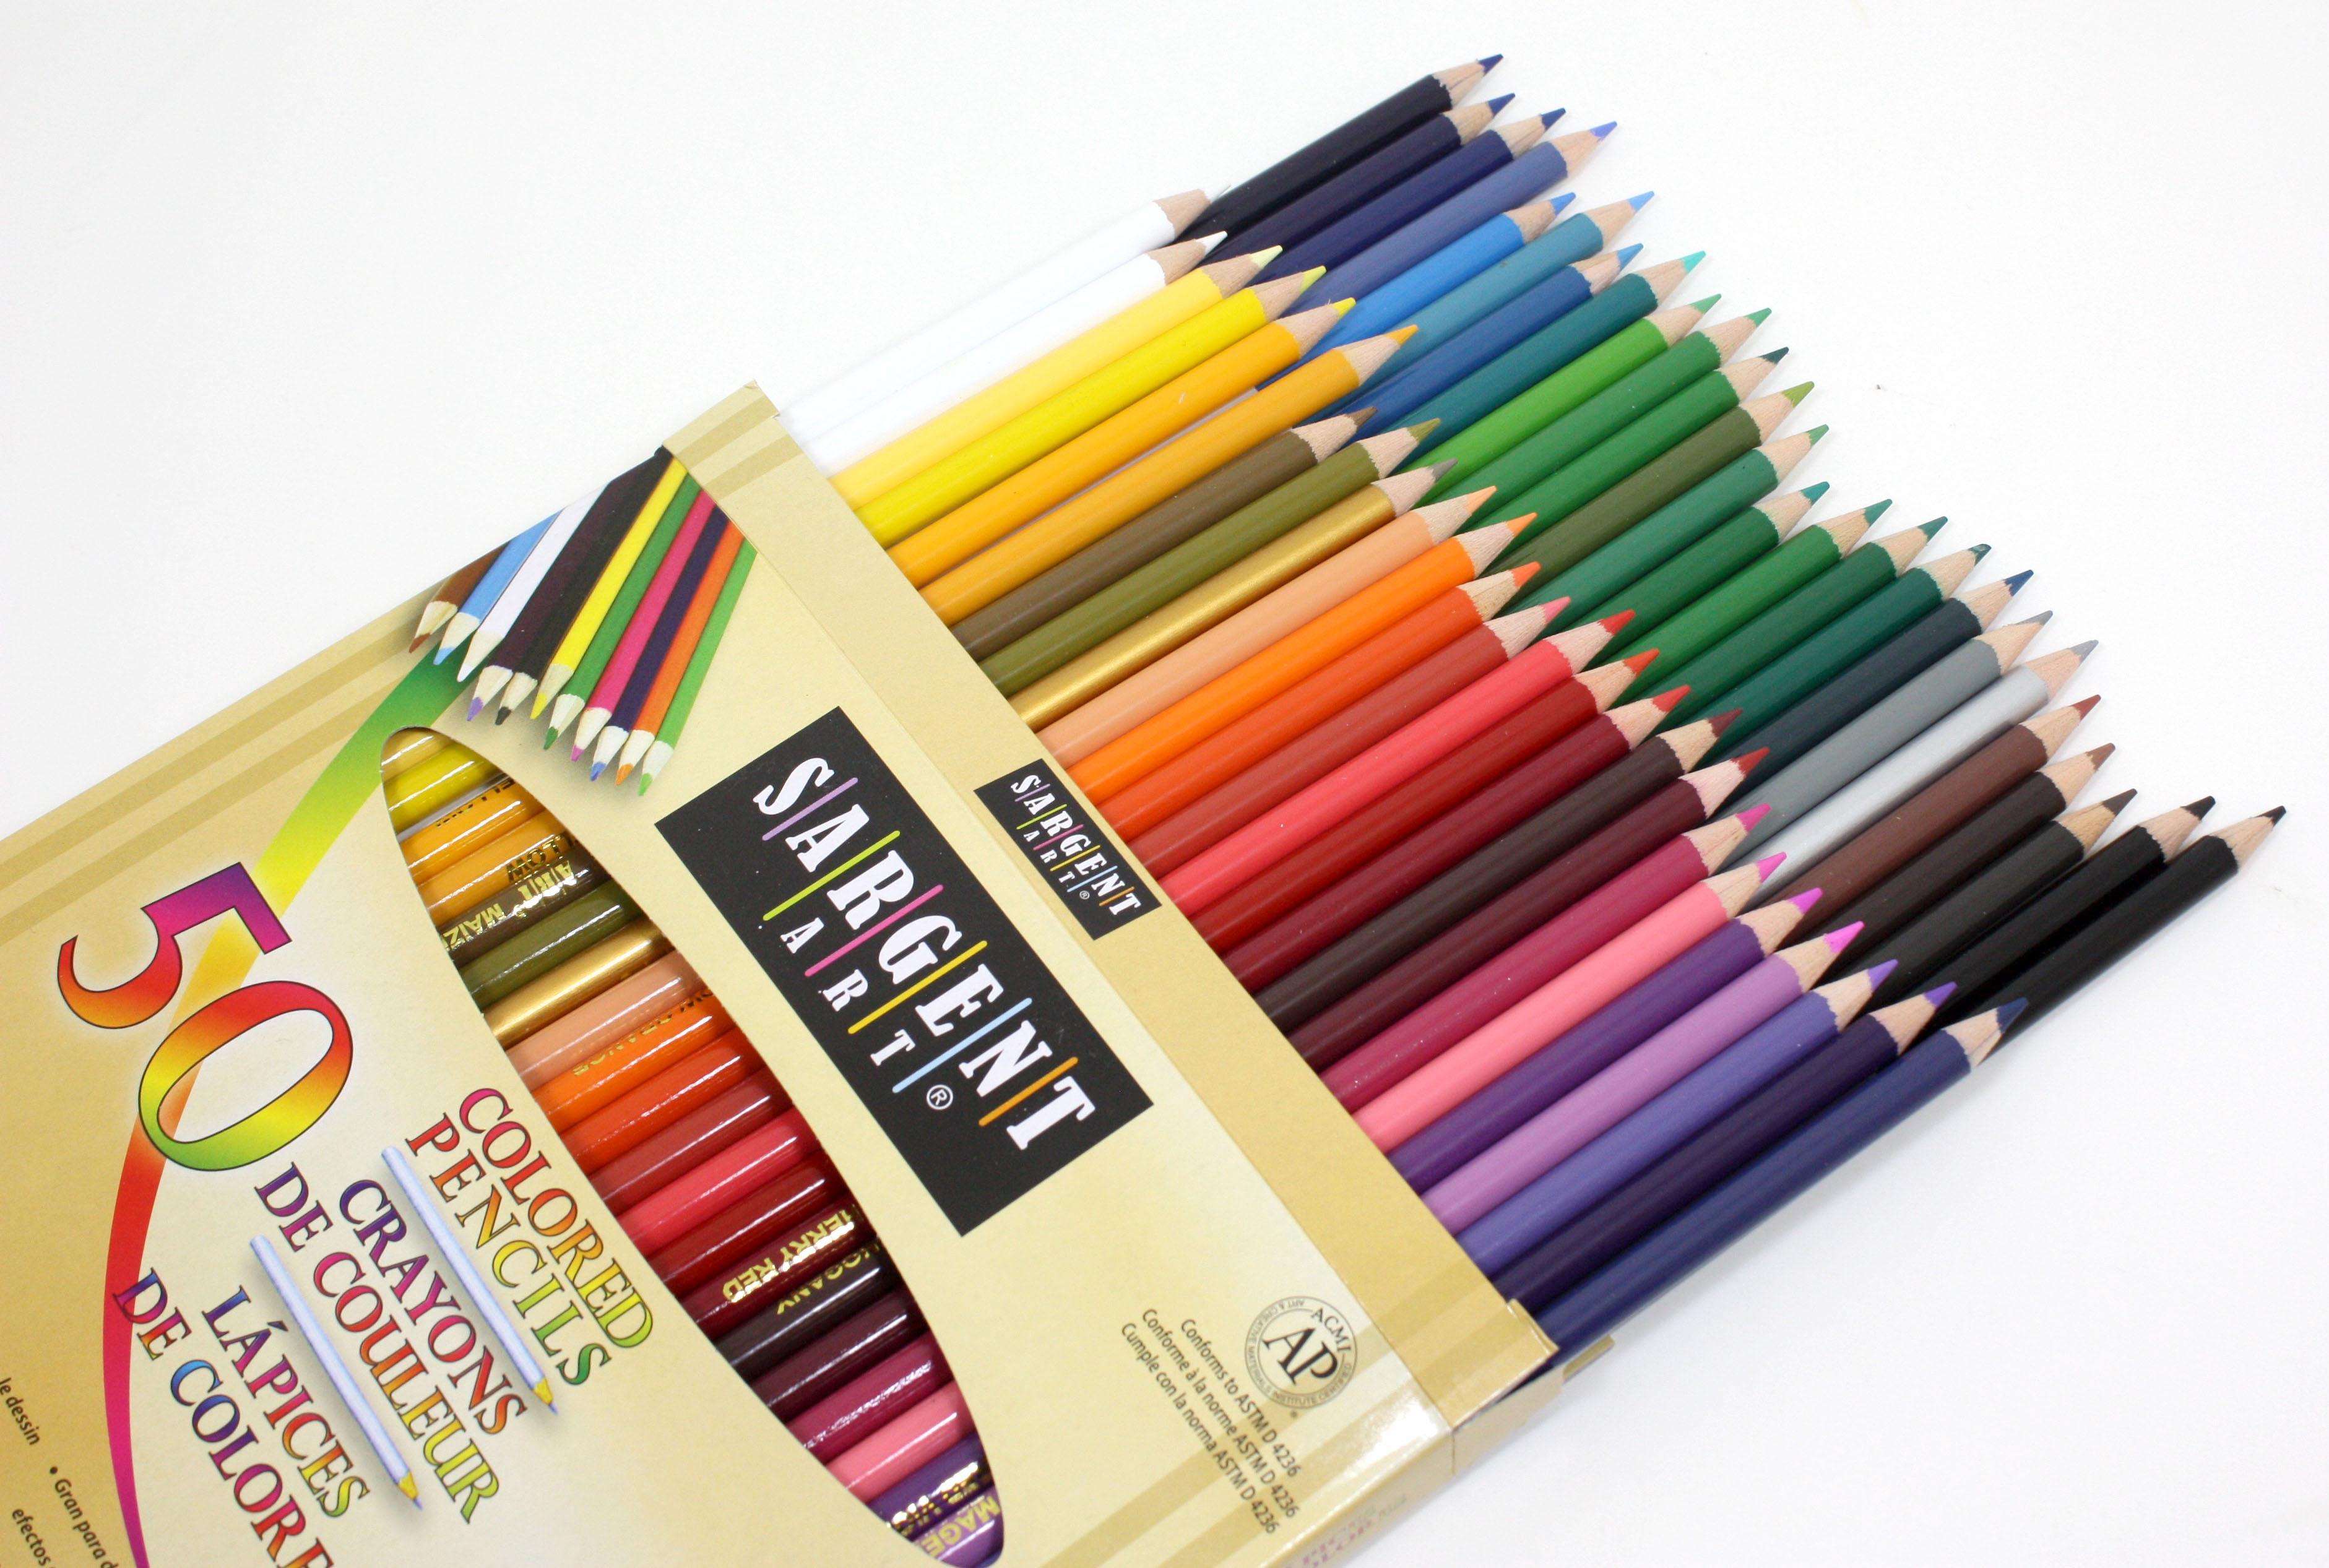 Gallery: Colored Art Pencils, - Drawings Art Gallery